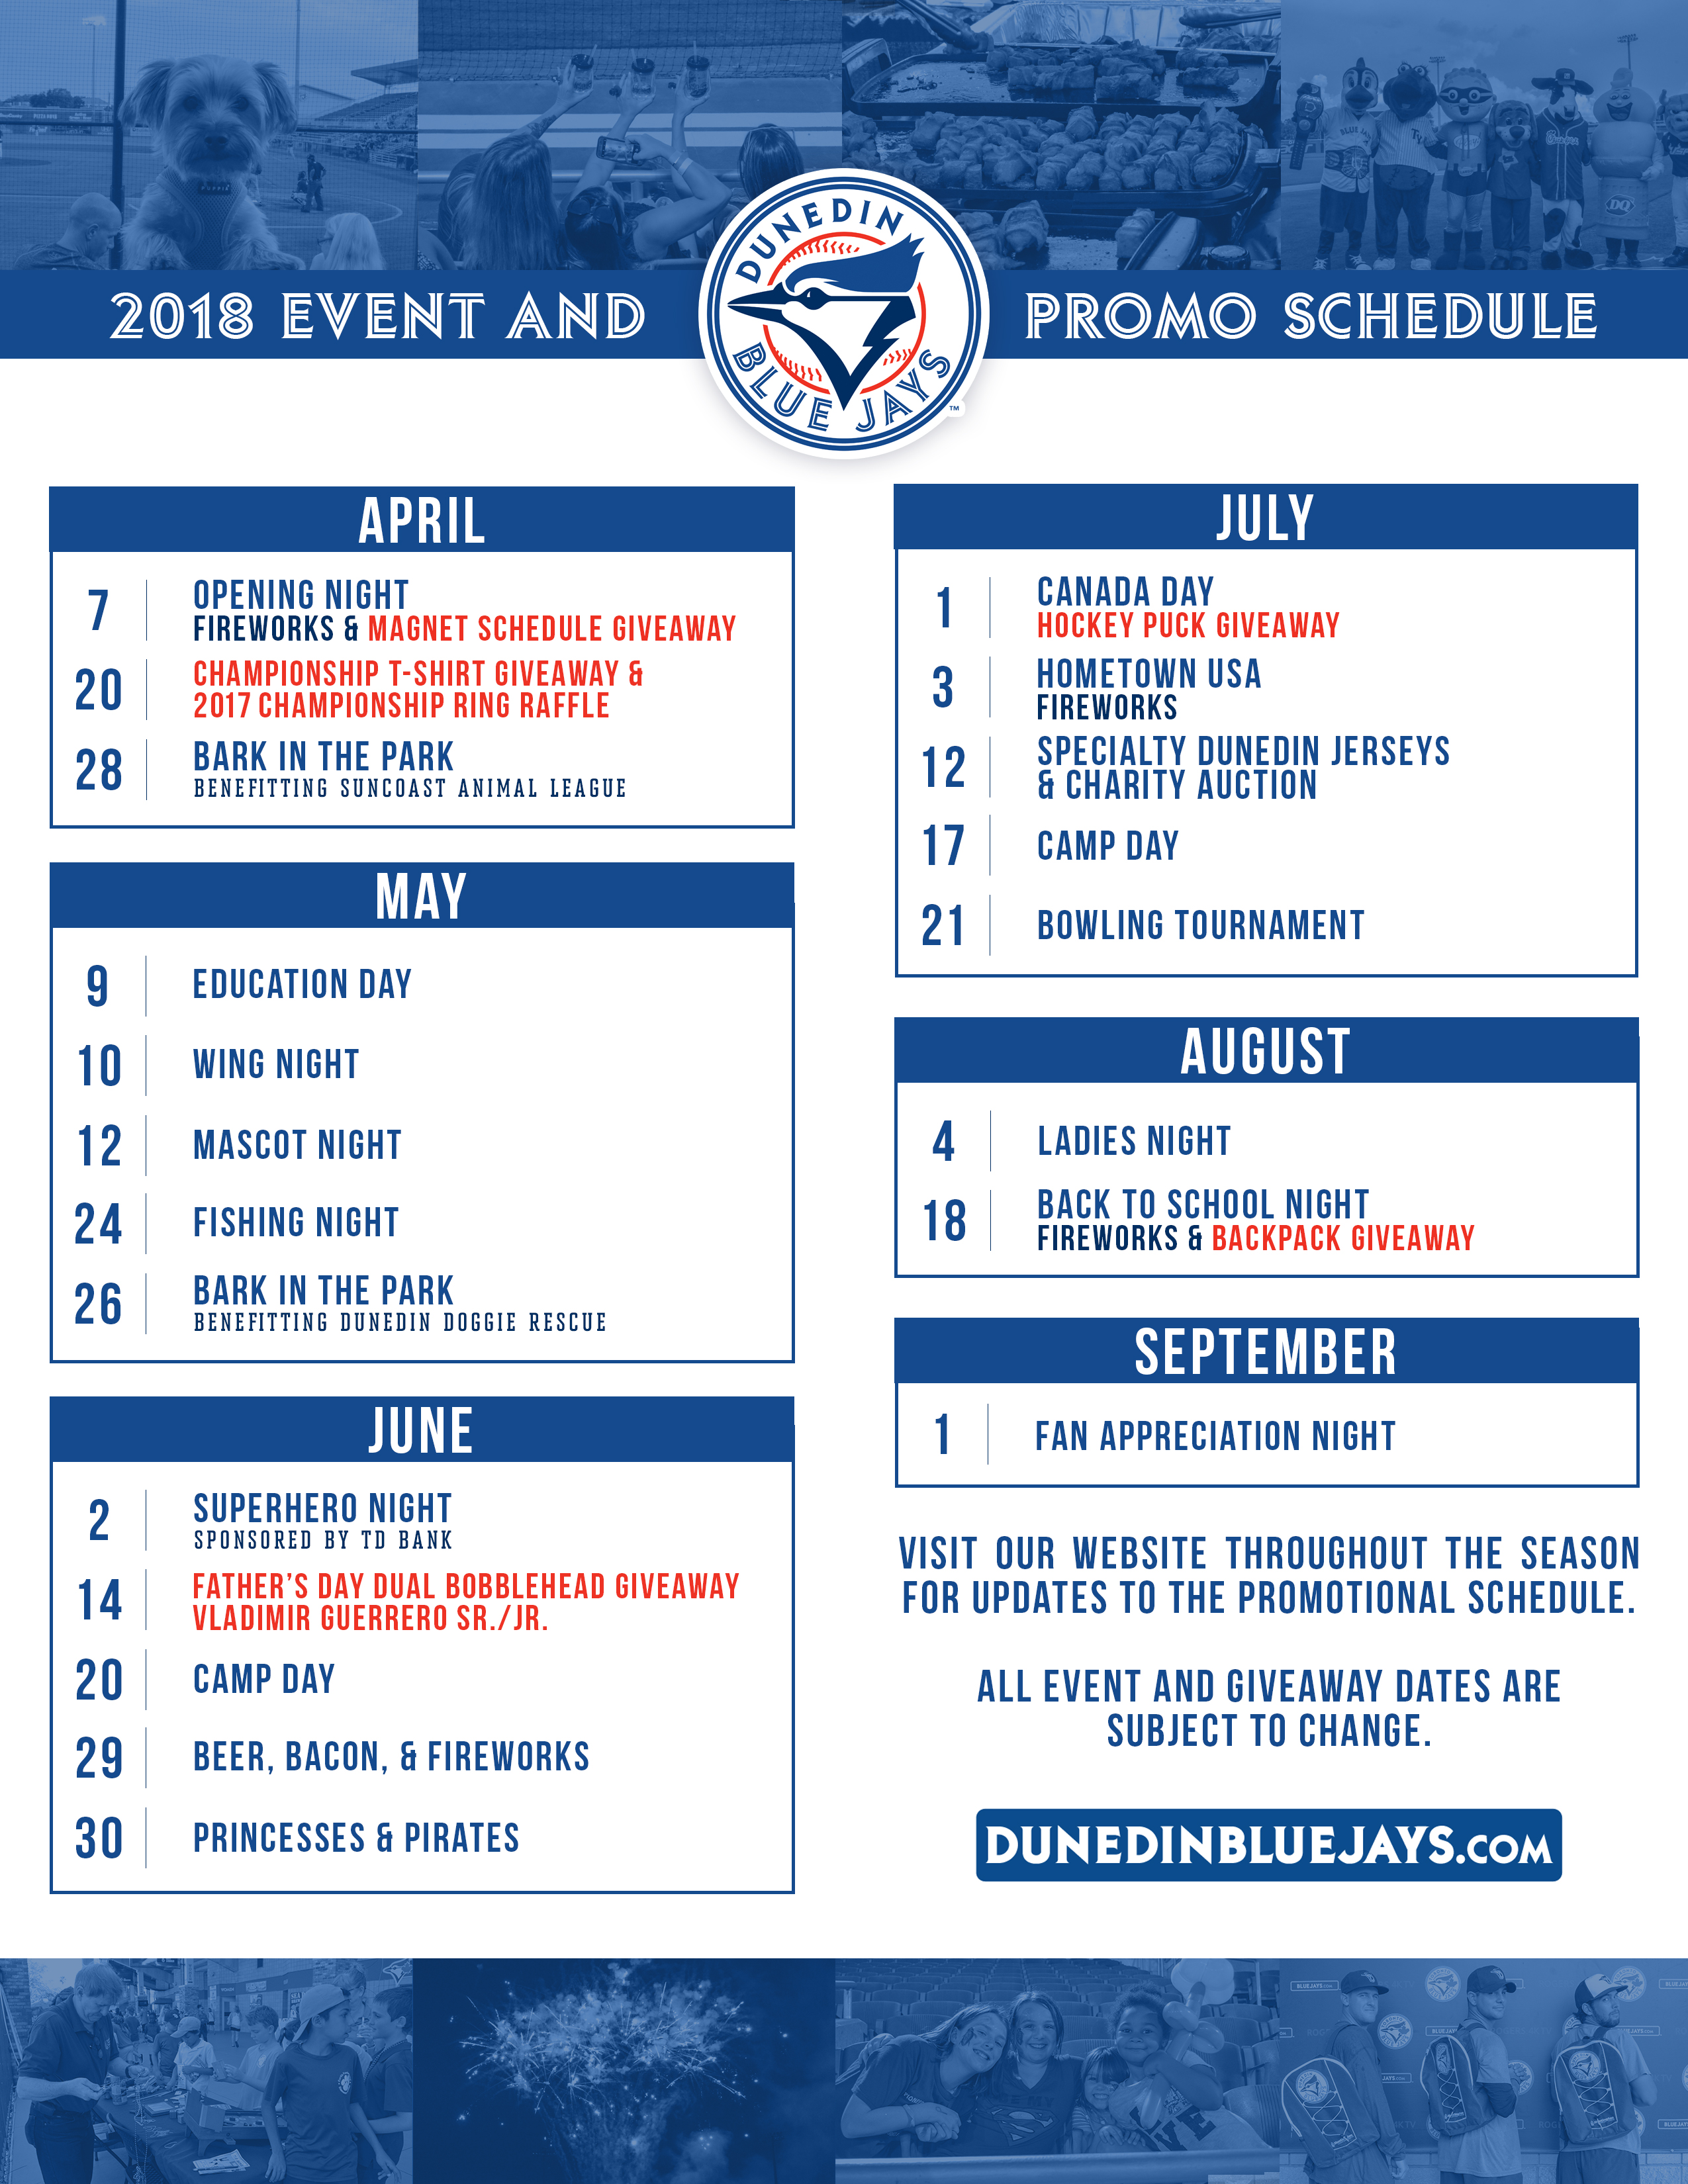 Dodgers Promotional Schedule 2019 Ticket Options   Dunedin Blue Jays Tickets